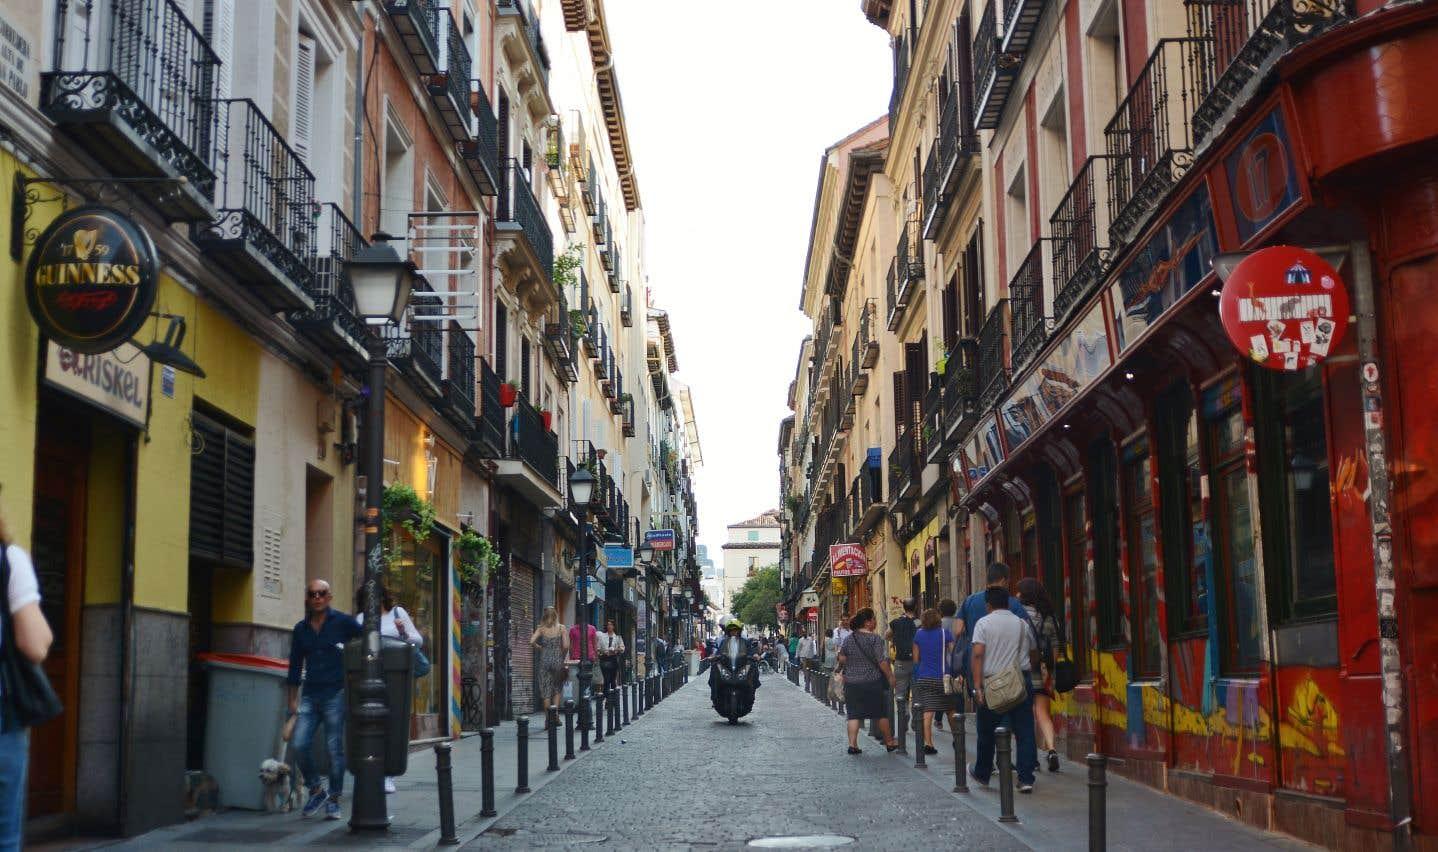 Malasaña, l'âme bohème et rebelle de Madrid